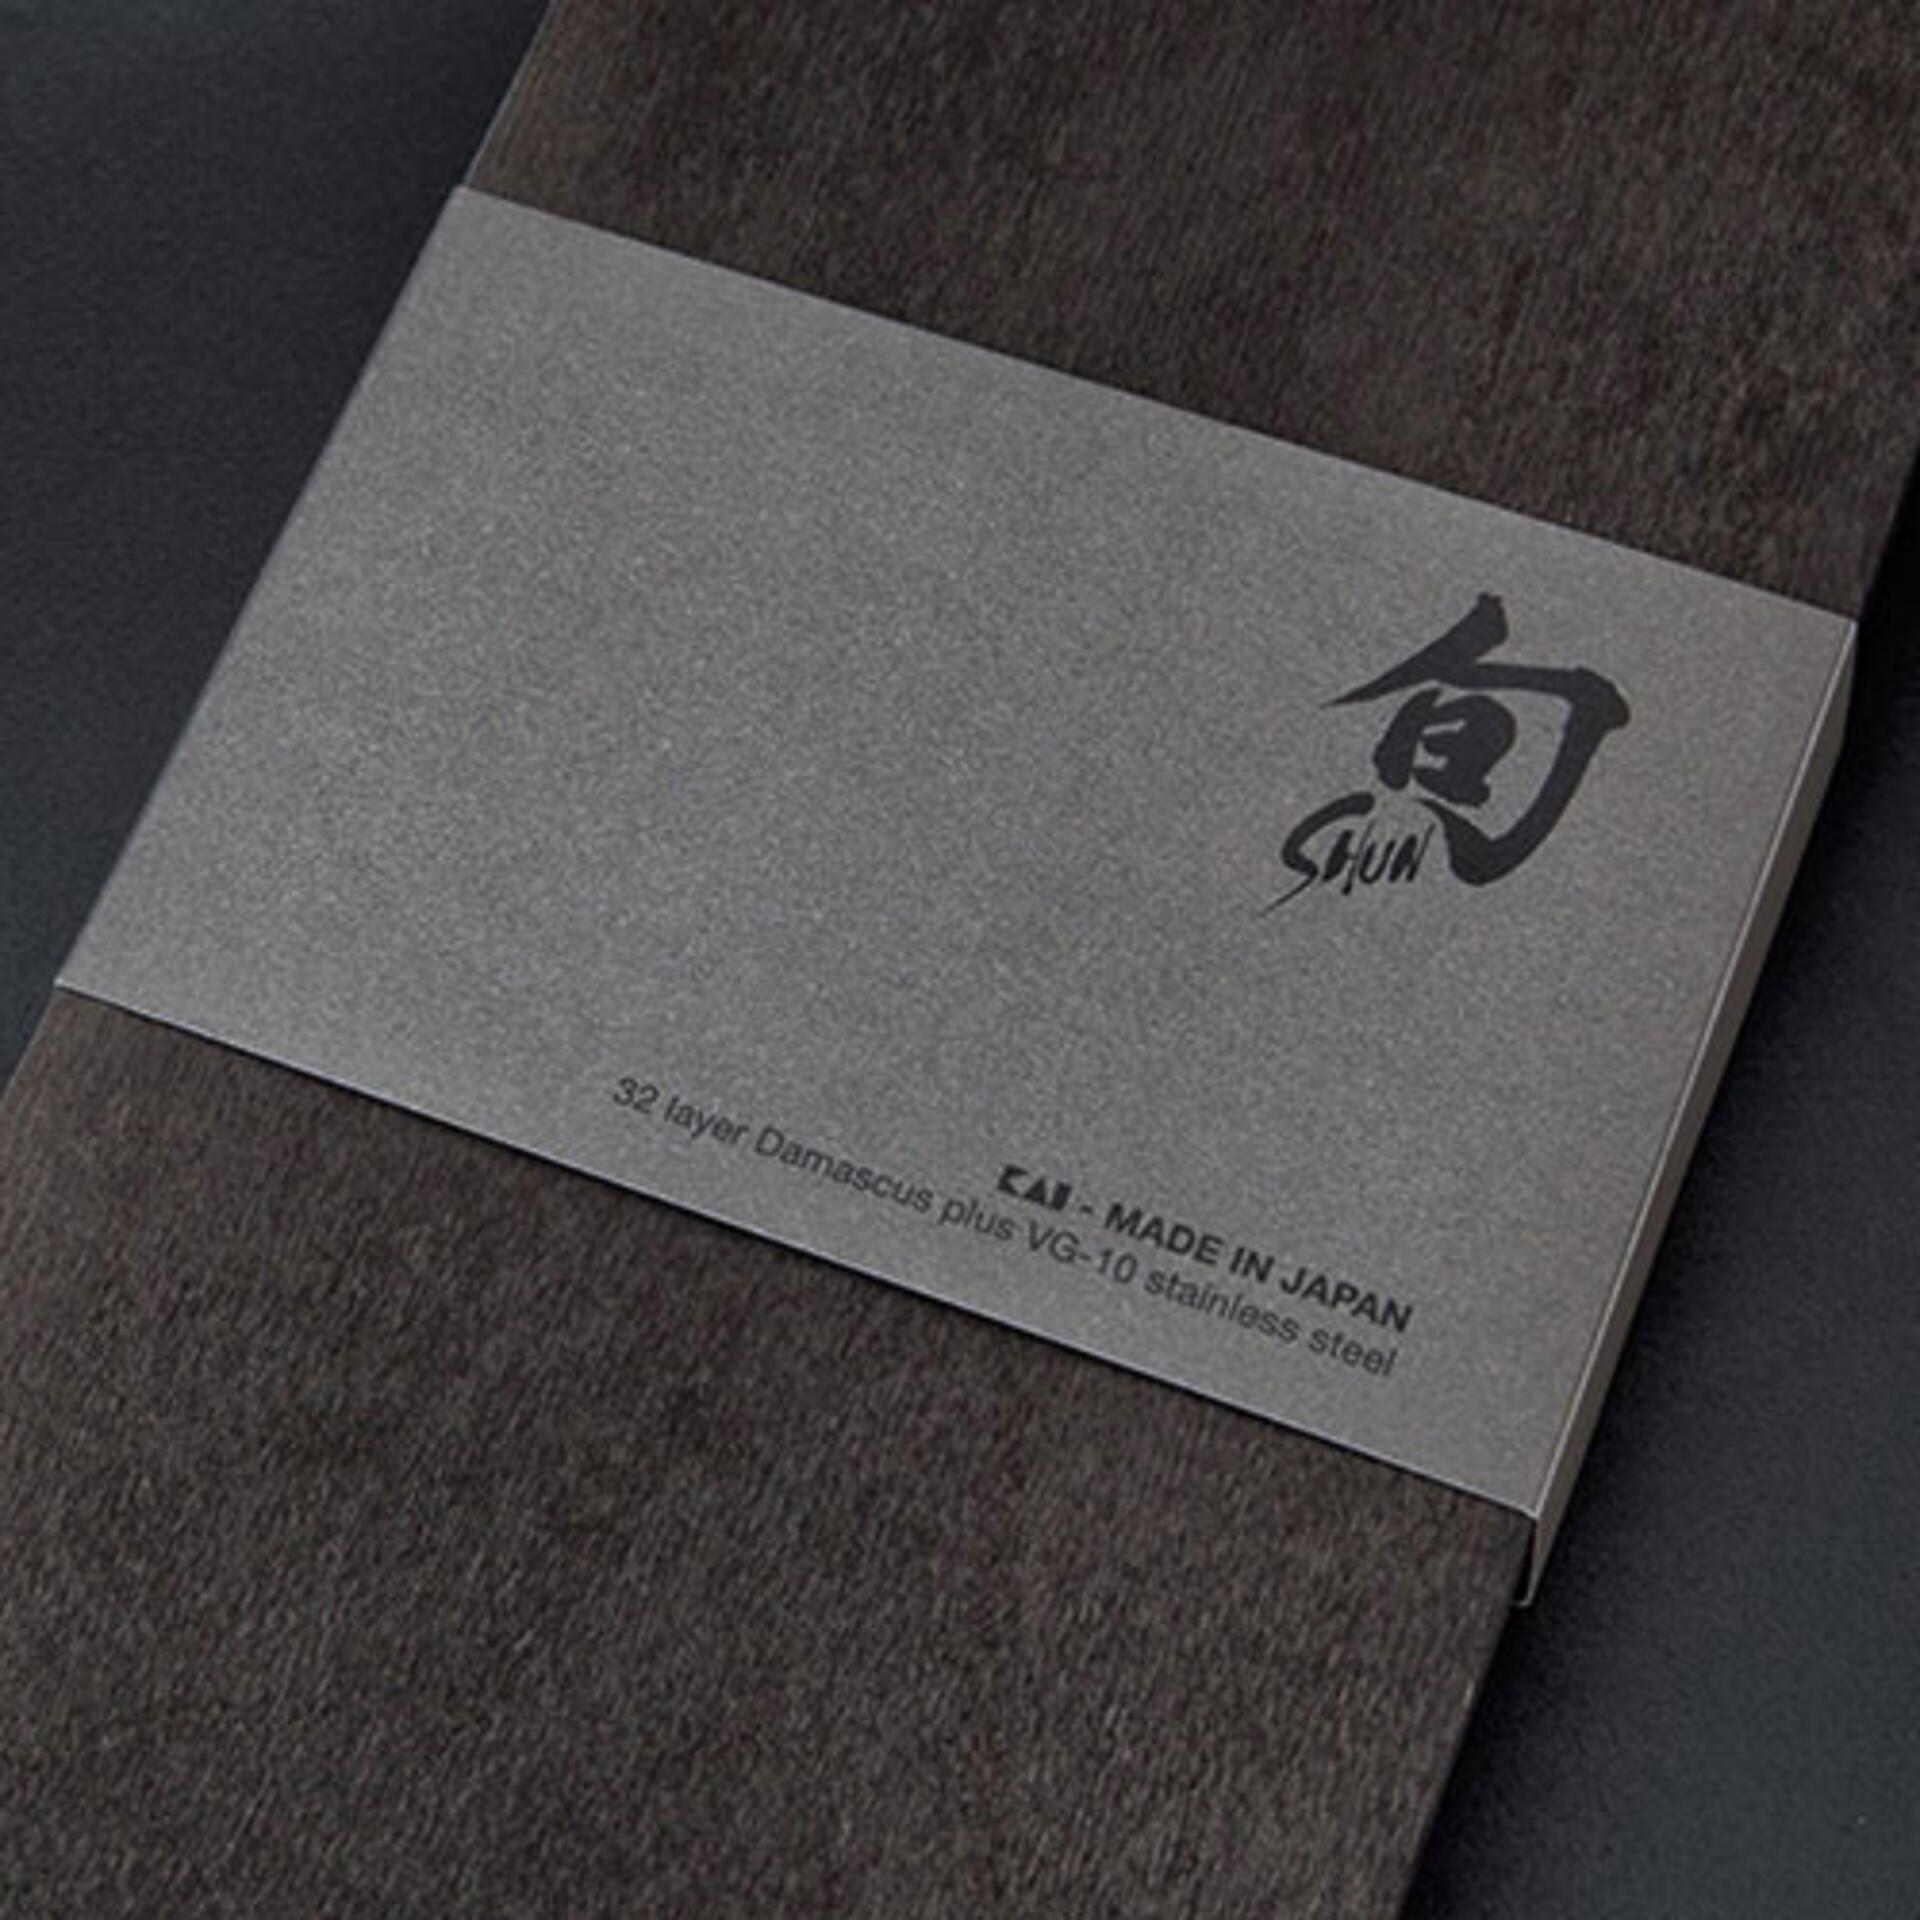 KAI Shun Classic Großes Kochmesser DM-0707